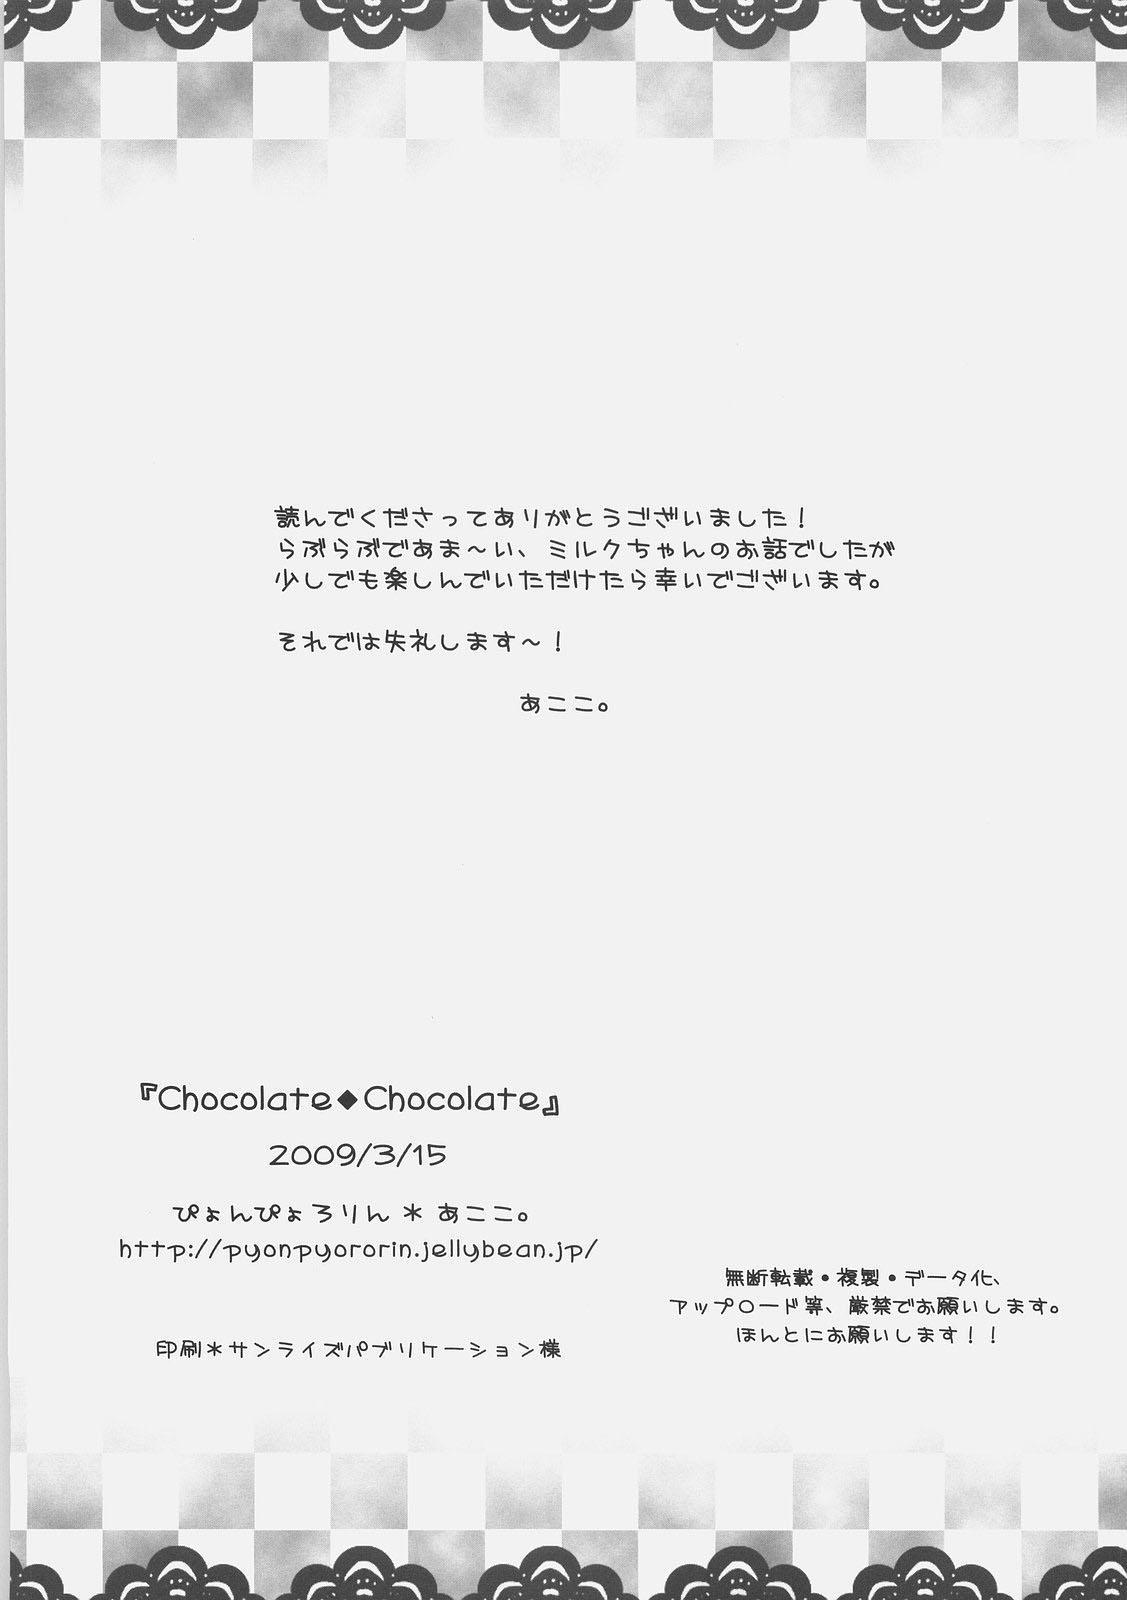 Chocolate-Chocolate 15